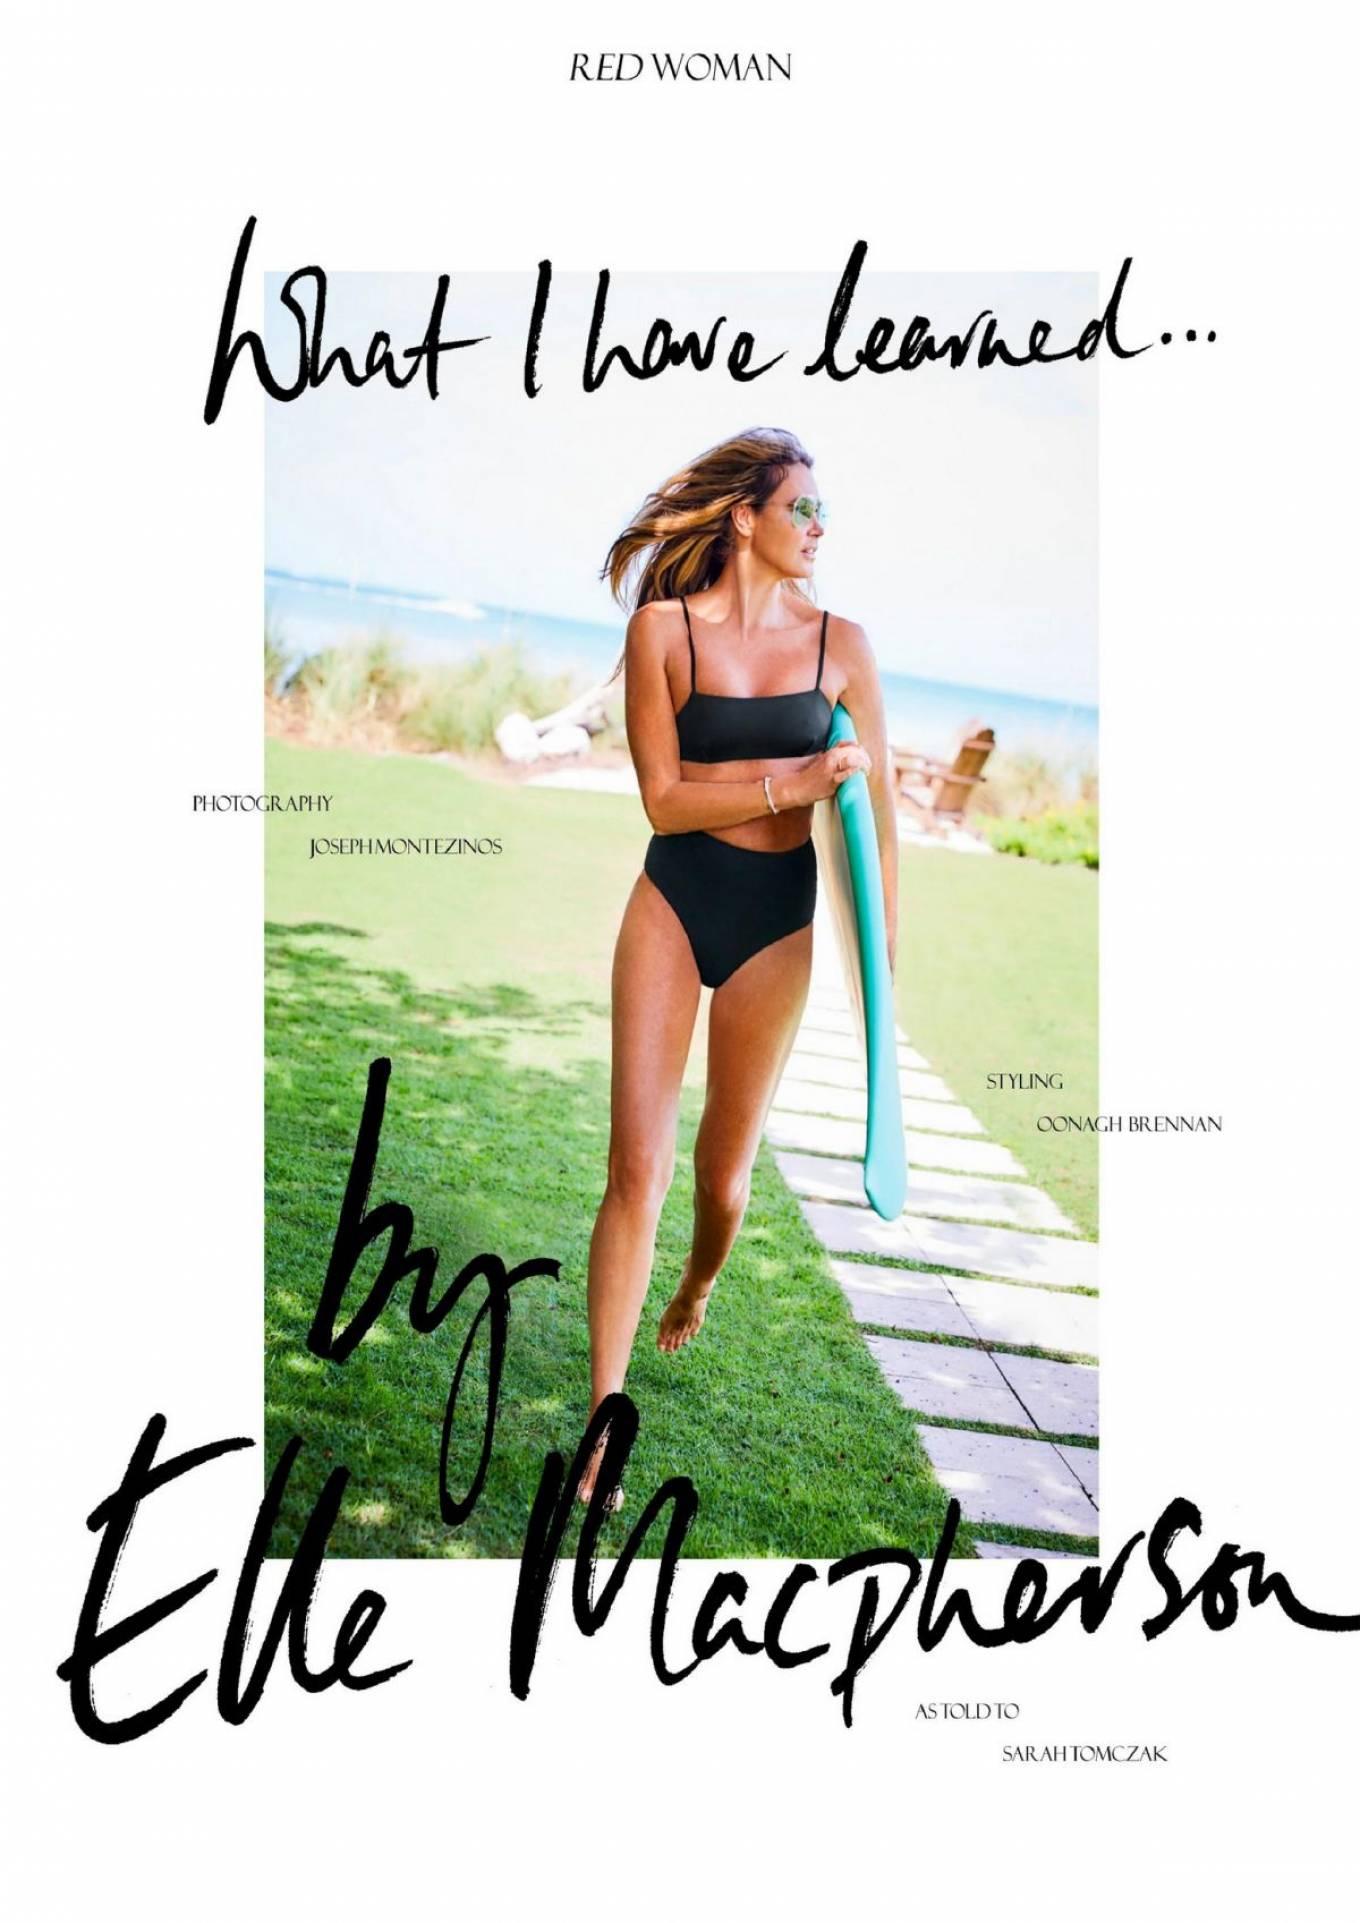 Elle MacPherson 2020 : Elle MacPherson – Red Magazine (UK – August 2020 isseu)-02